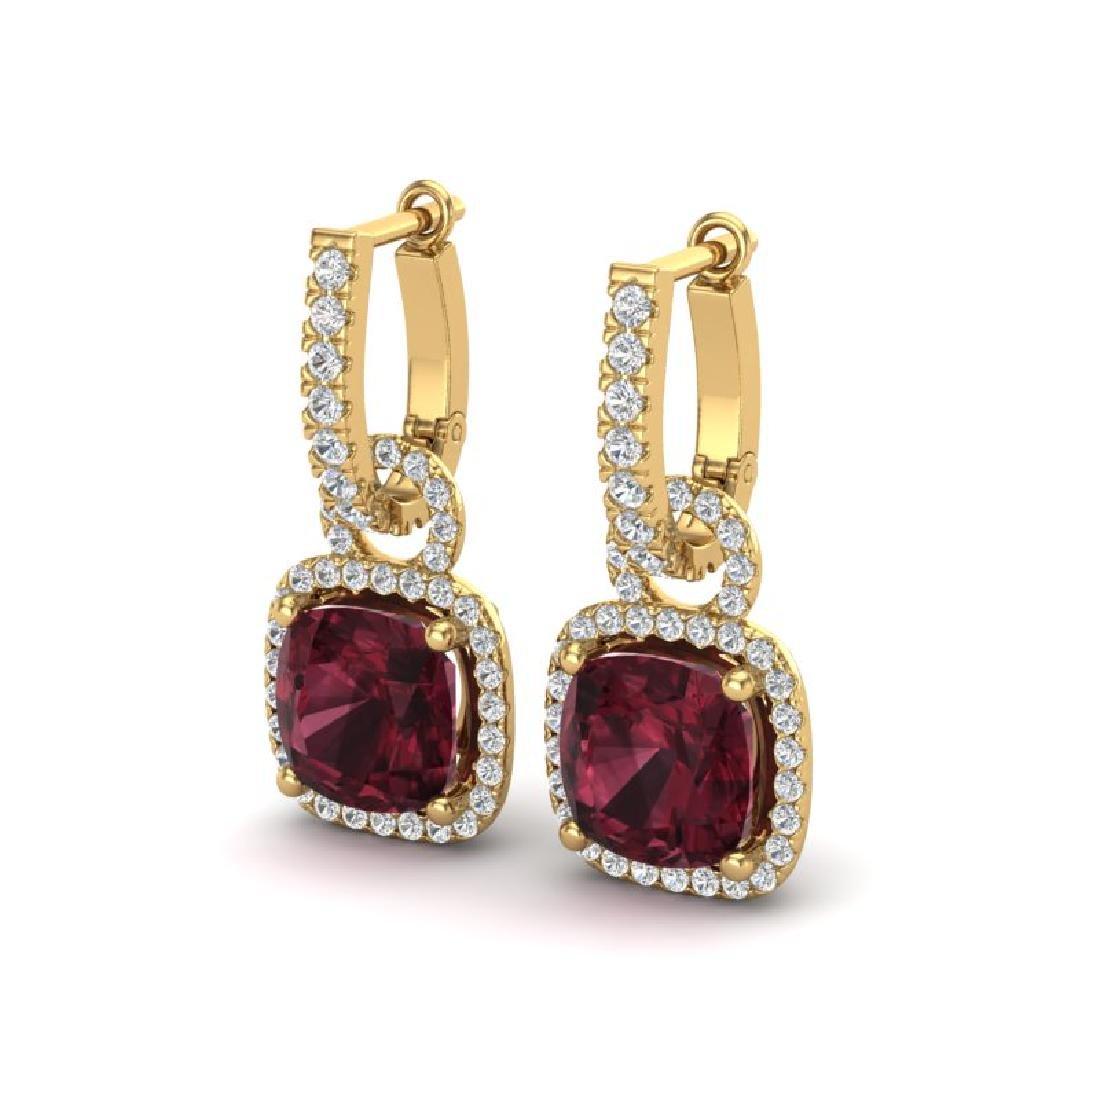 7 CTW Garnet & Micro Pave VS/SI Diamond Earrings 18K